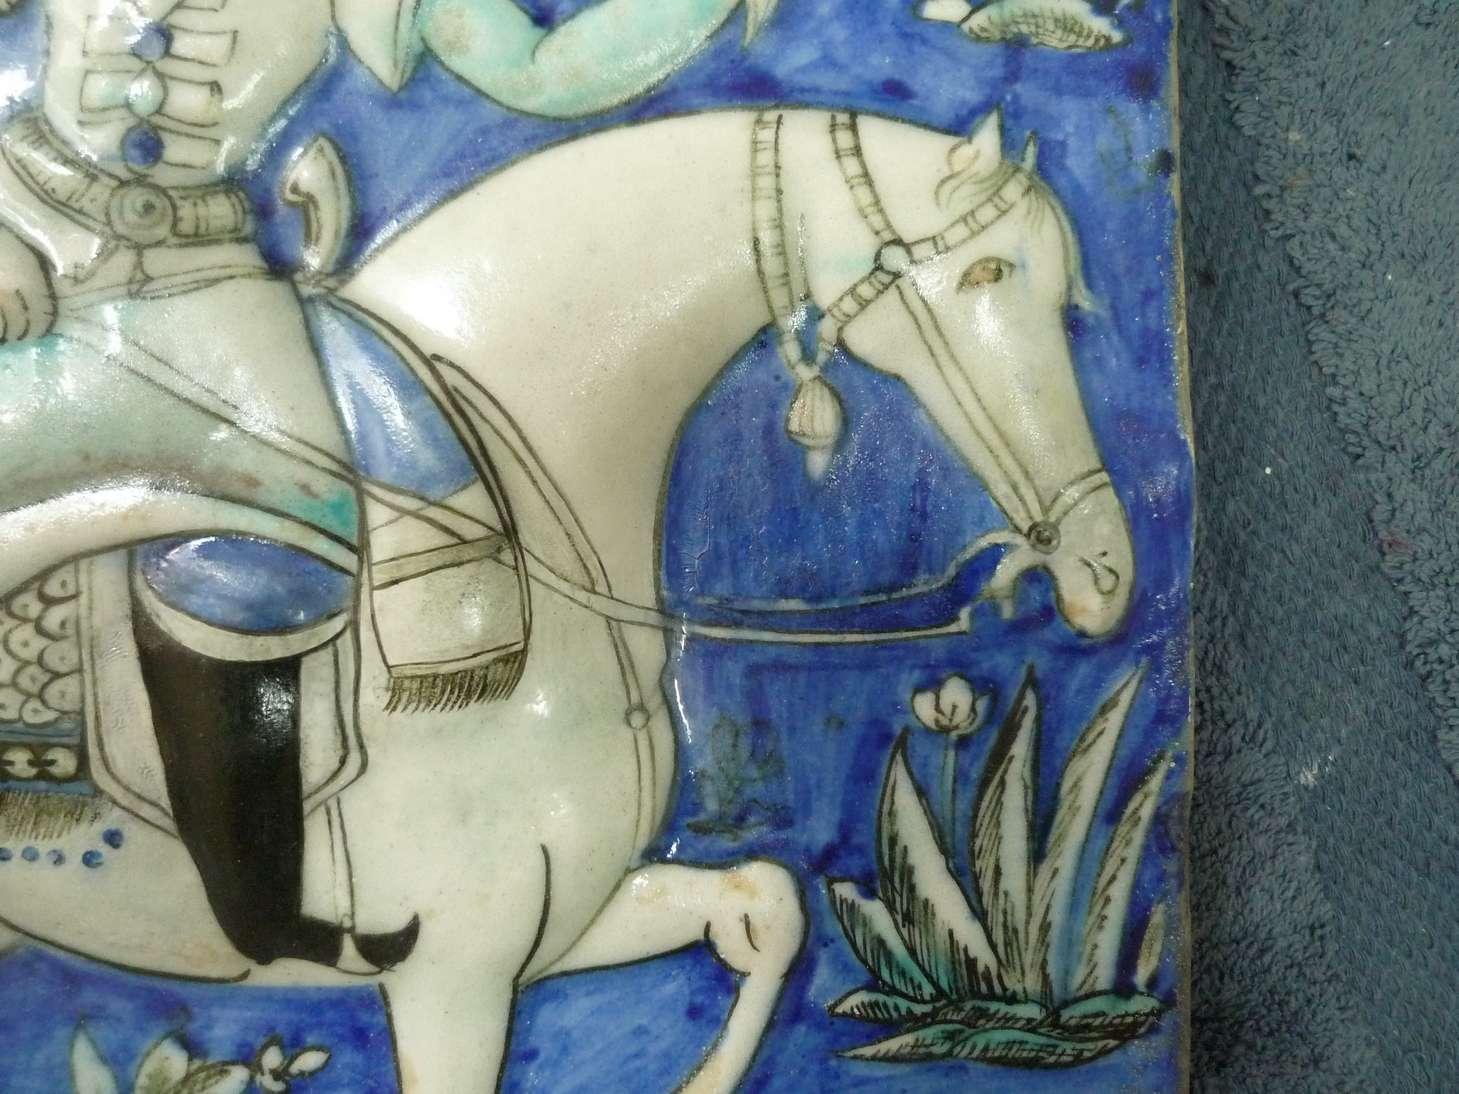 decor-gres-palais-perse-qajar-iran-email-decoration-architecture-art-resauration-restaurarte.JPG